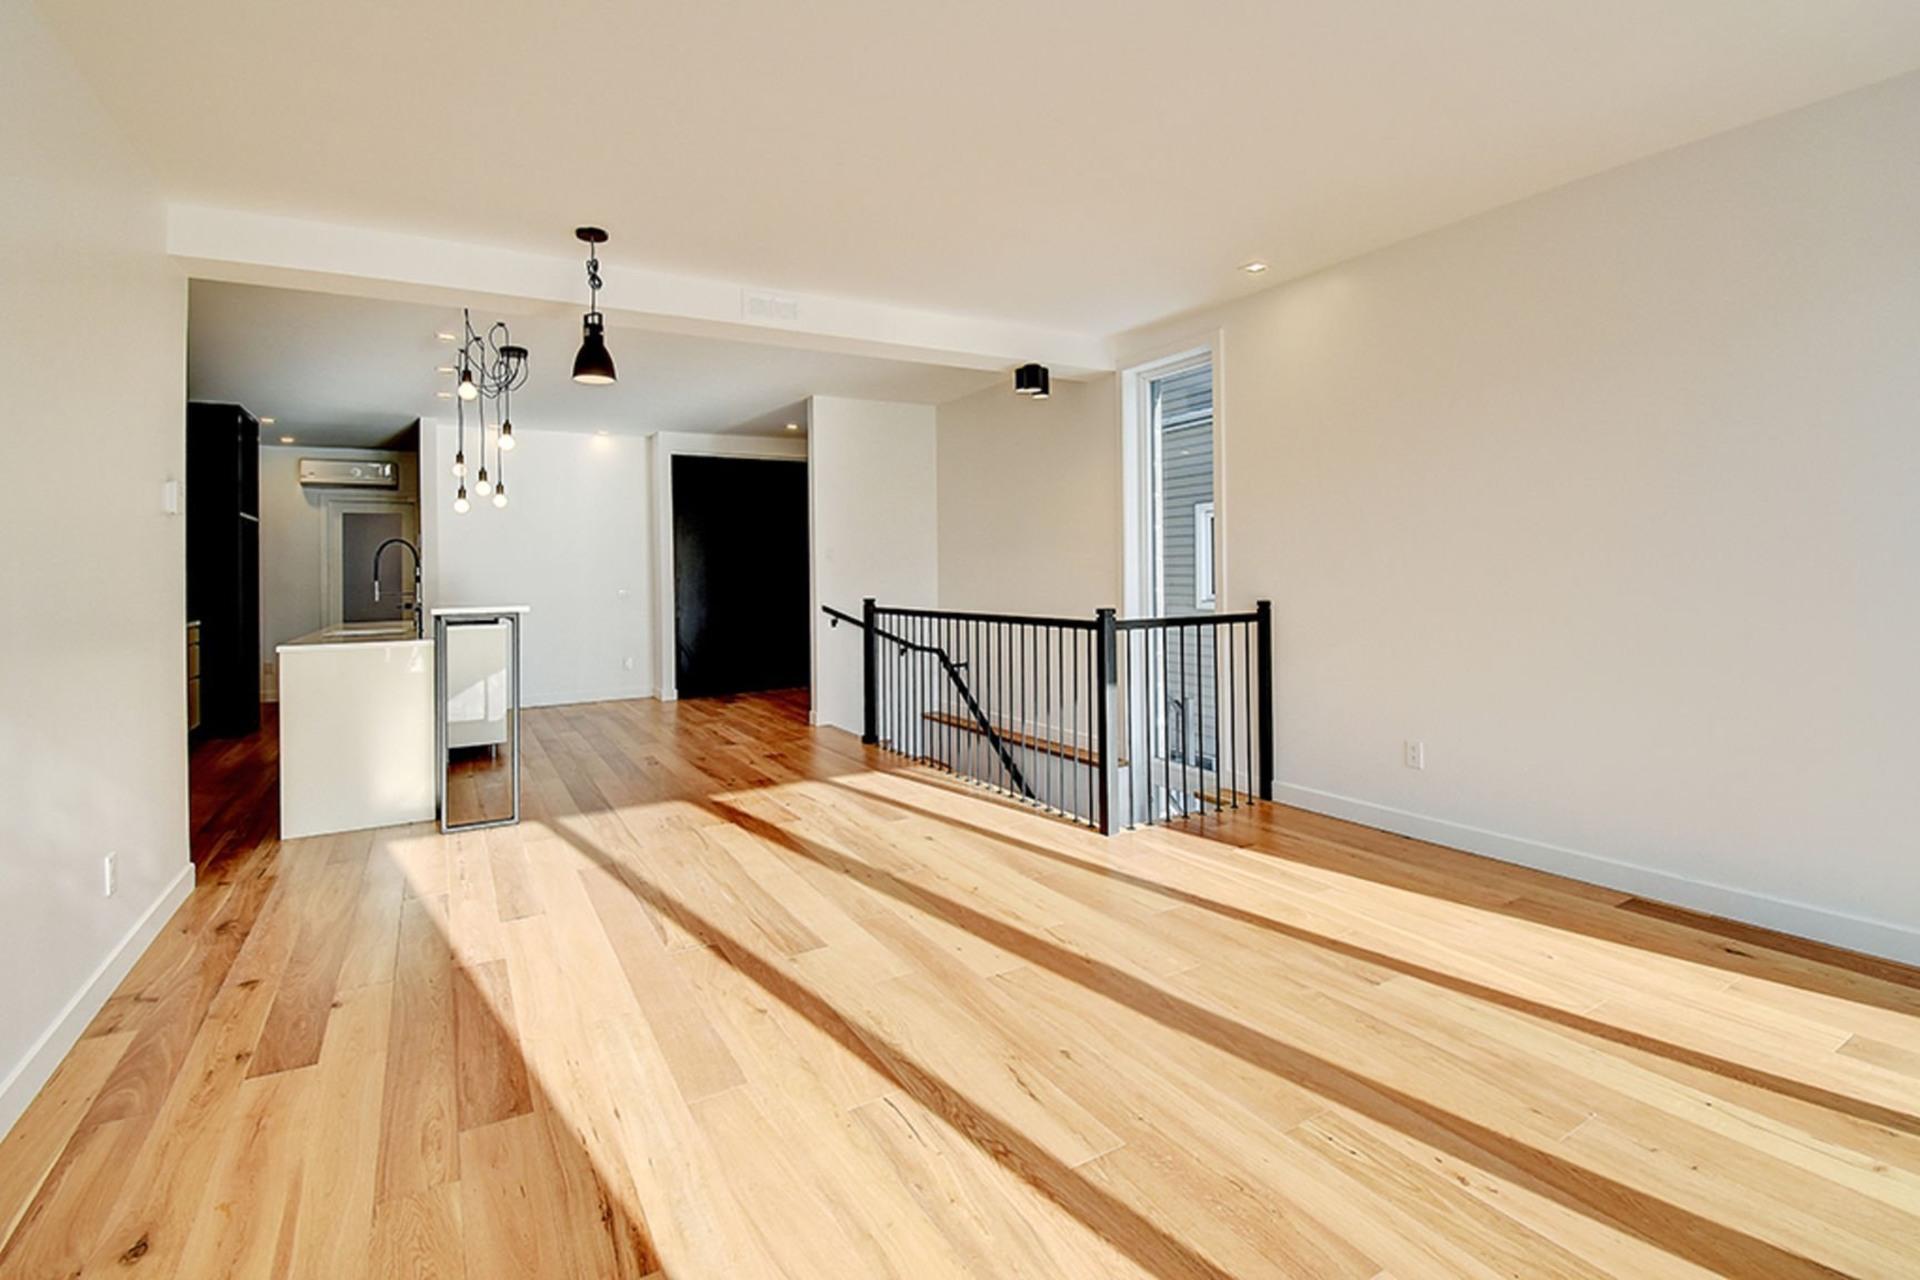 image 5 - Apartment For sale Le Vieux-Longueuil Longueuil  - 9 rooms